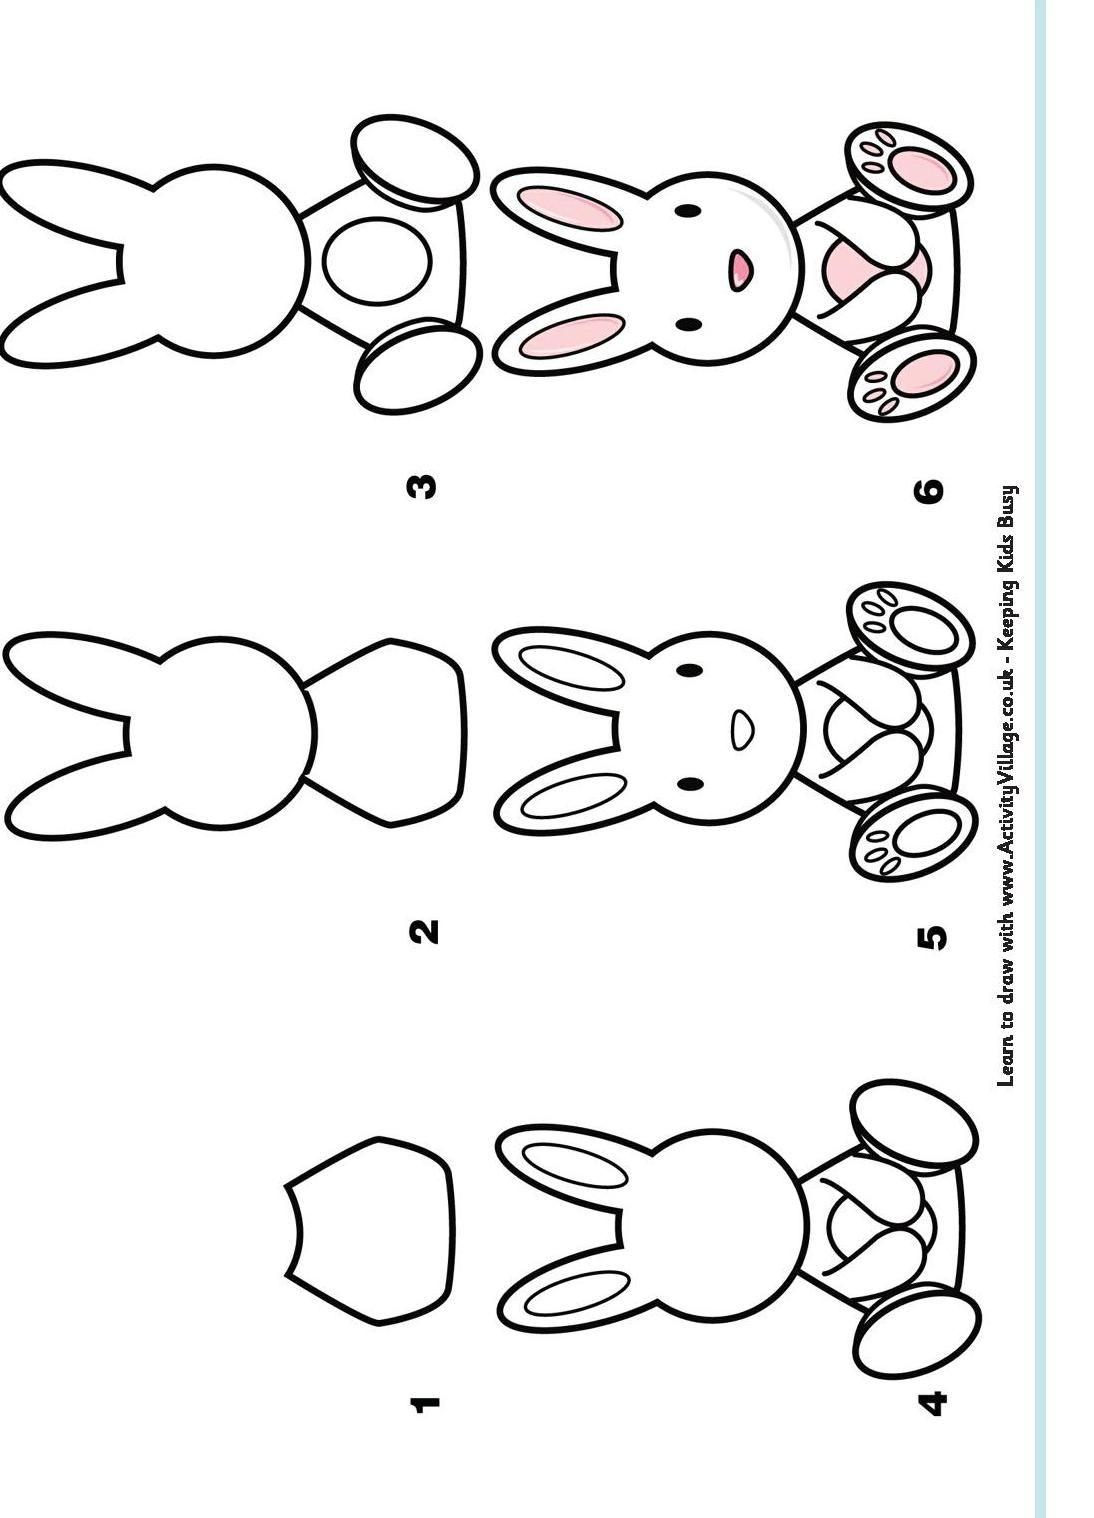 Learn To Draw A Rabbit Jpg 1 094 1 518 Piks Dessin Lapin Apprendre A Dessiner Dessin Coloriage